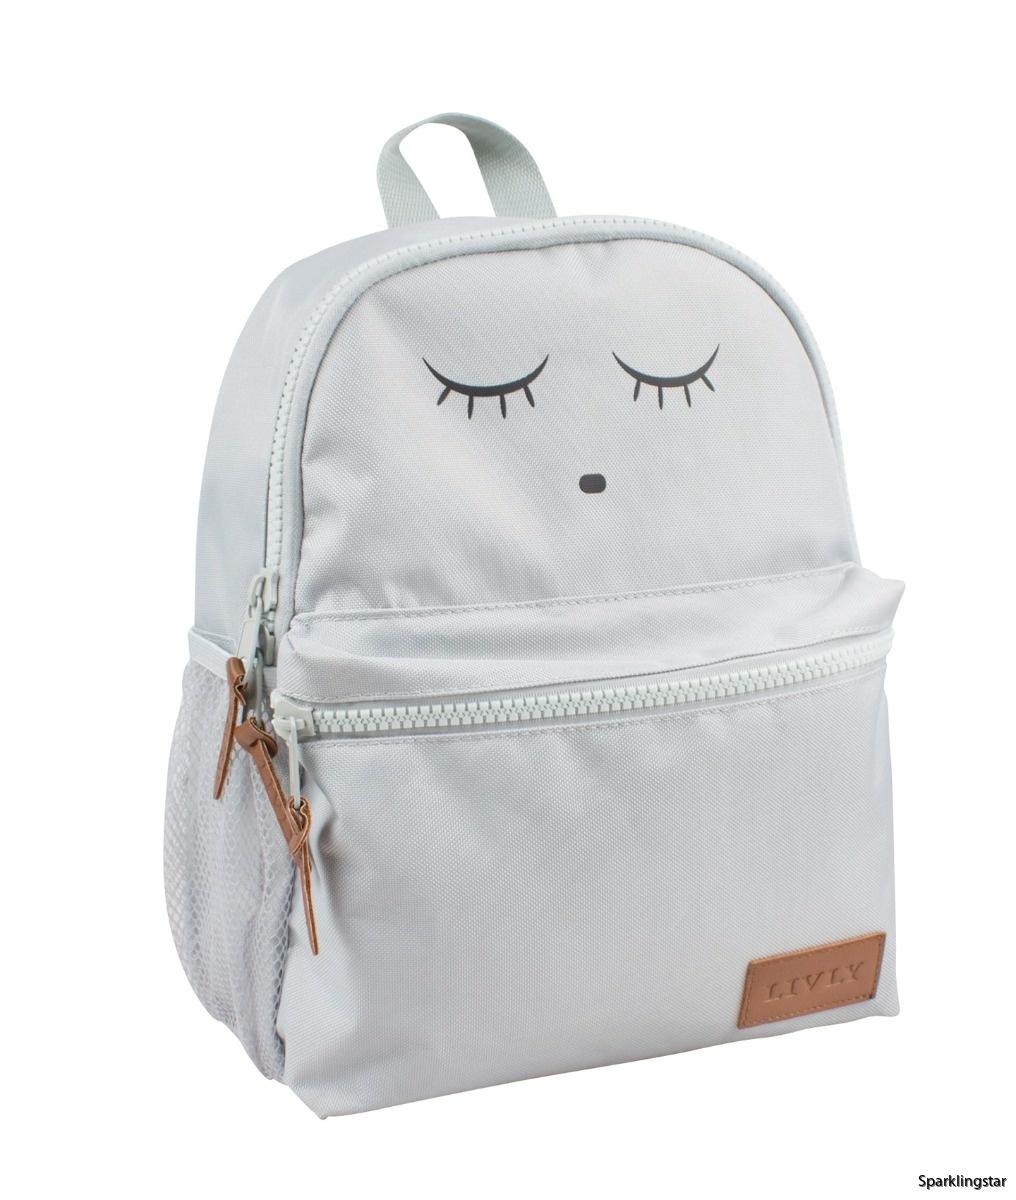 Livly Backpack Grey Sleeping Cutie